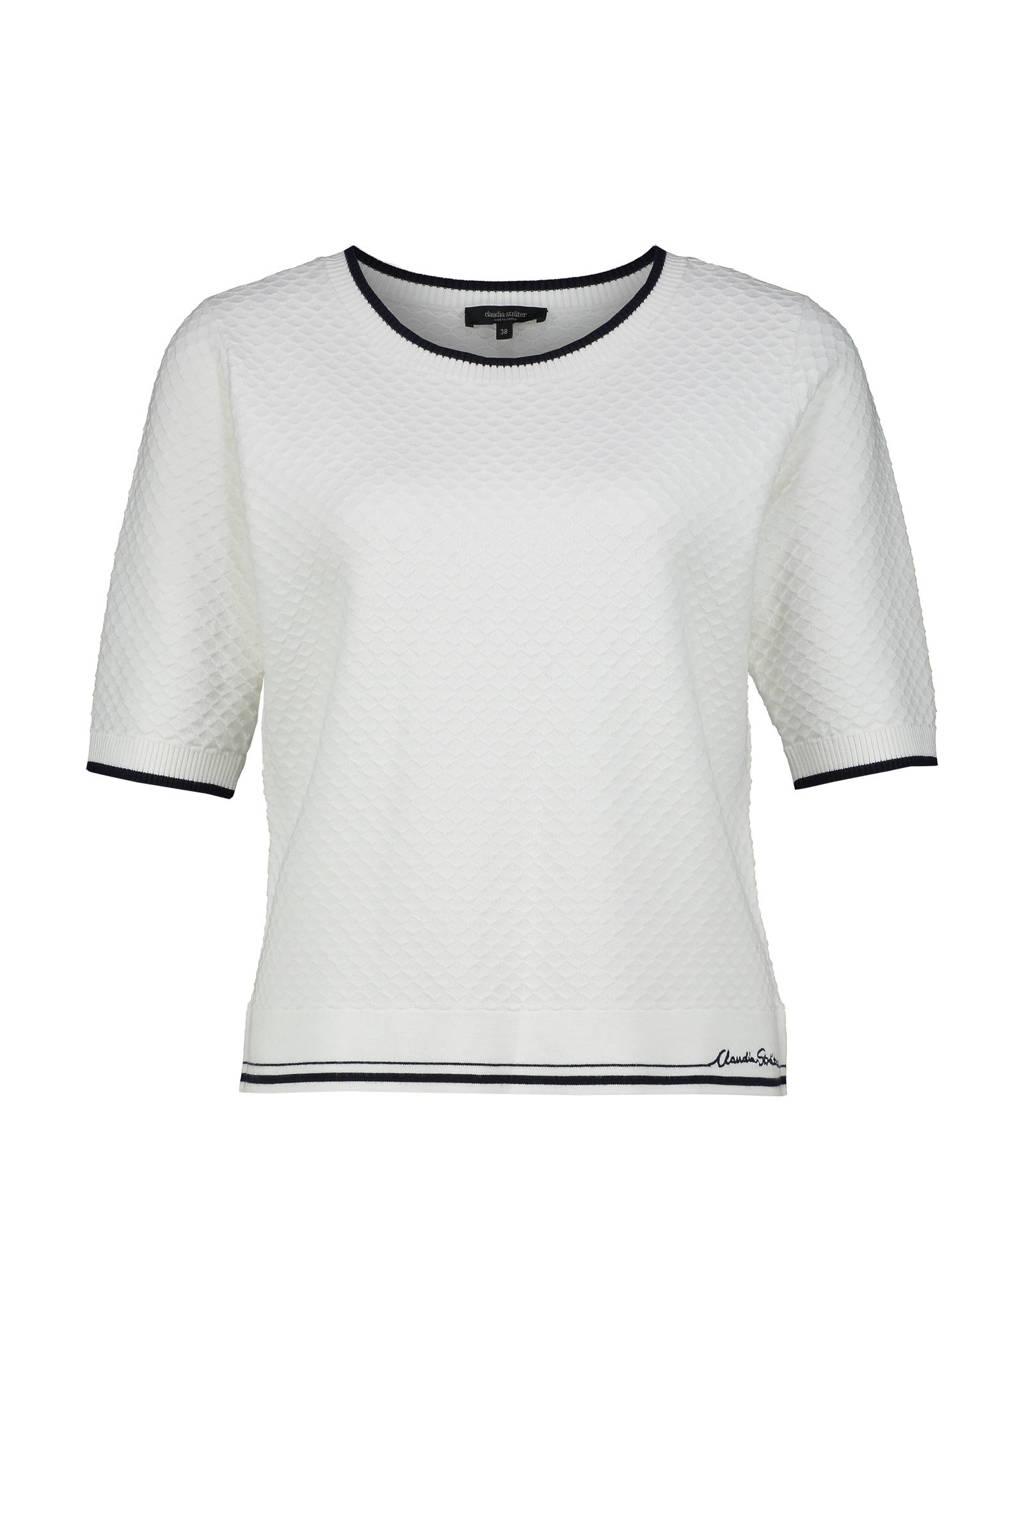 Claudia Sträter trui met contrastbies en borduursels wit/donkerblauw, Wit/donkerblauw